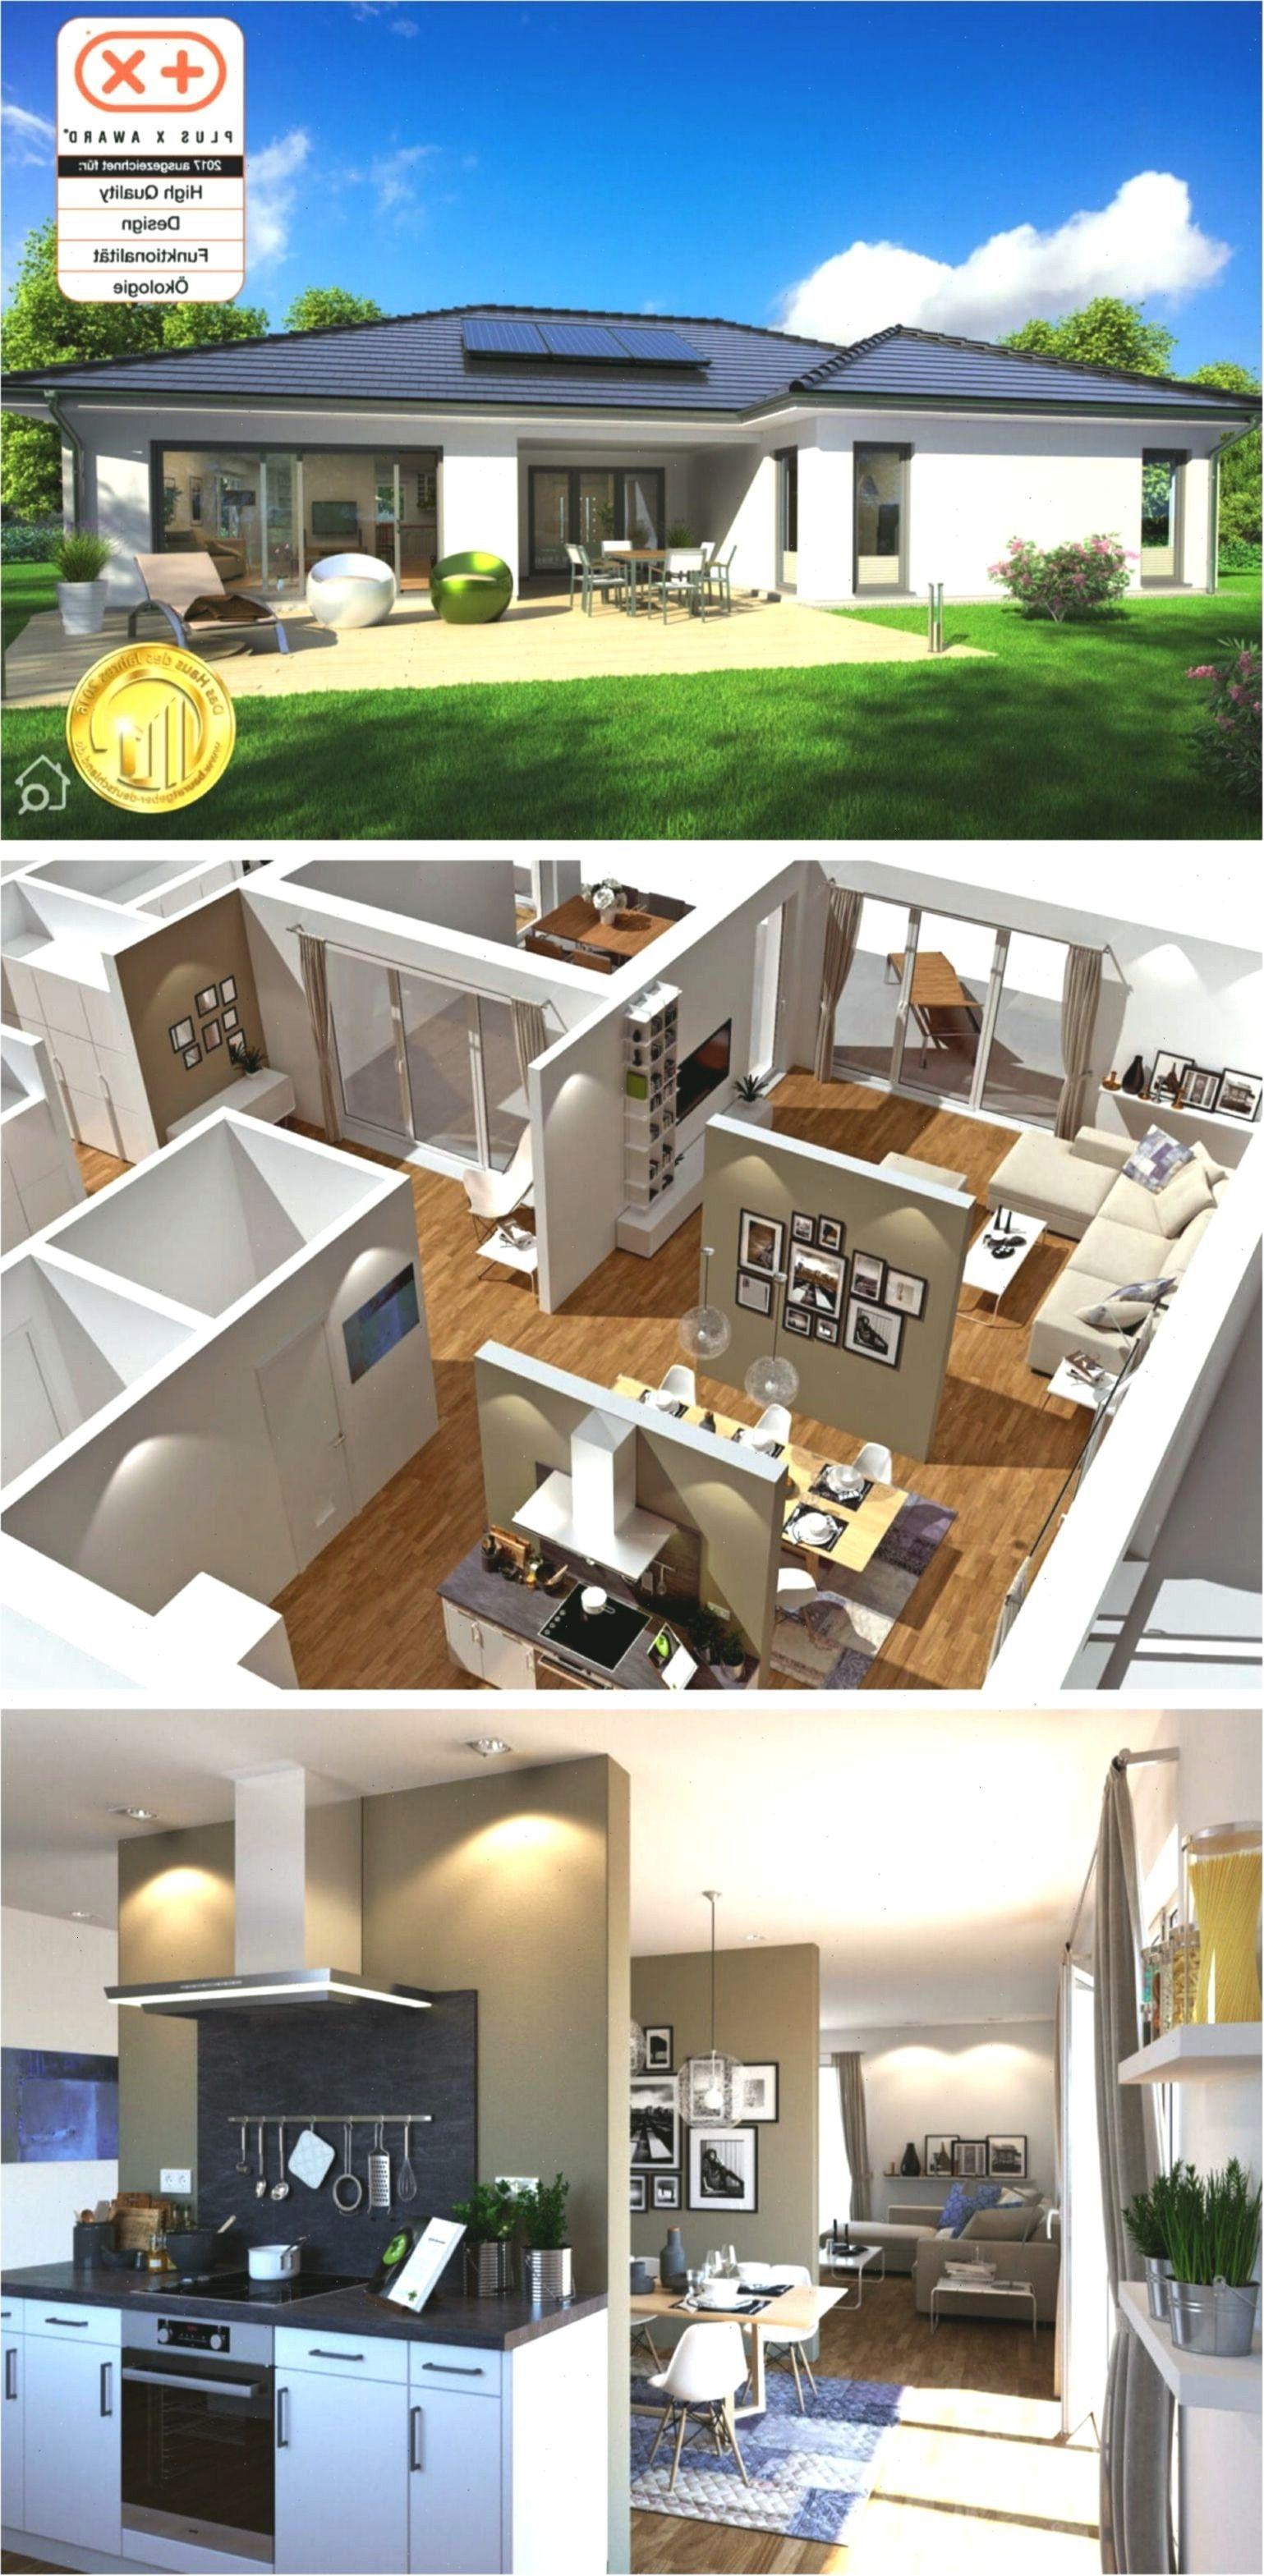 #homedecorideasmodern #contemporary #bungalow #european # ...